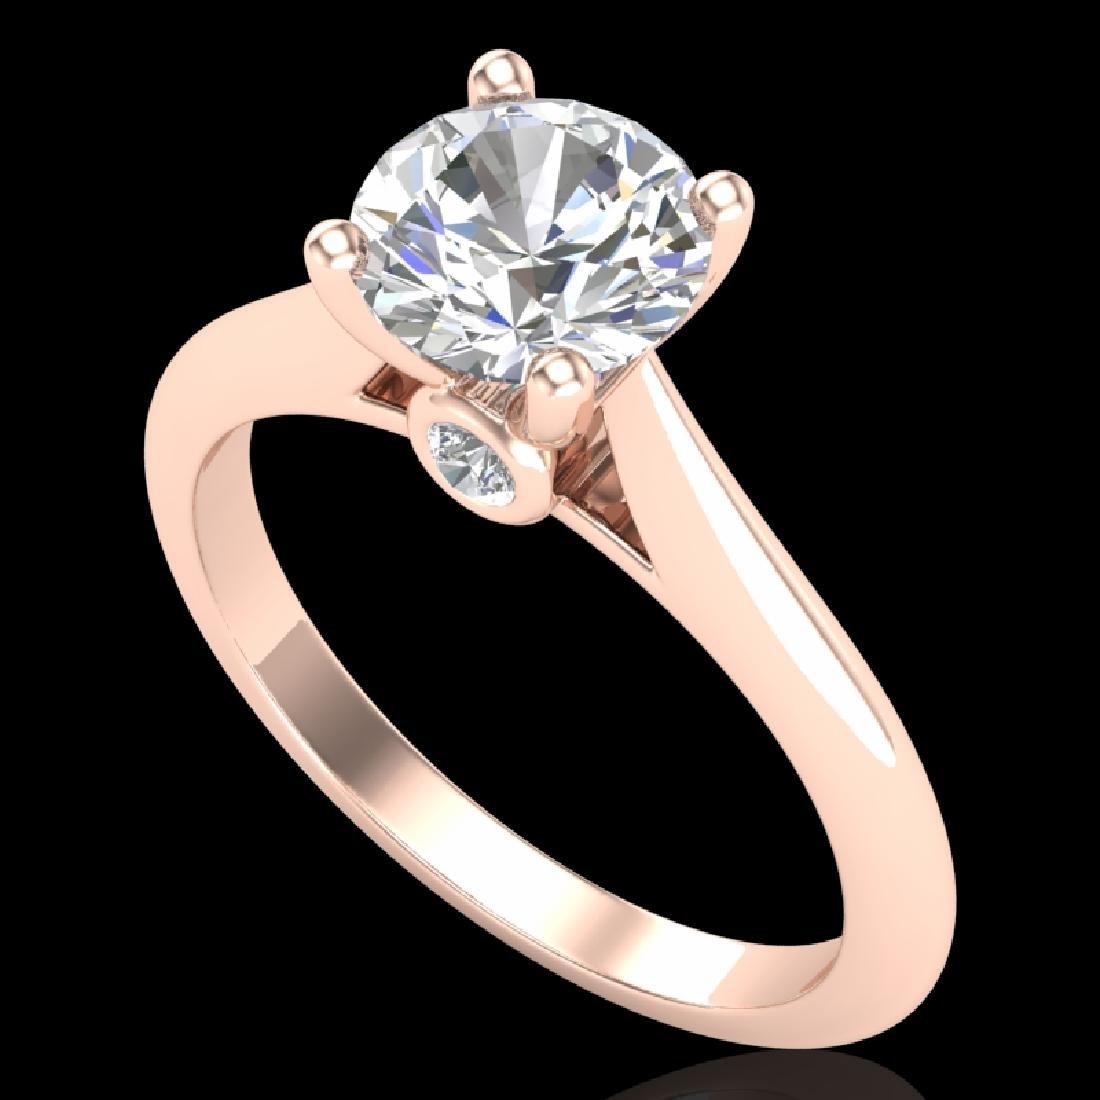 1.36 CTW VS/SI Diamond Solitaire Art Deco Ring 18K Rose